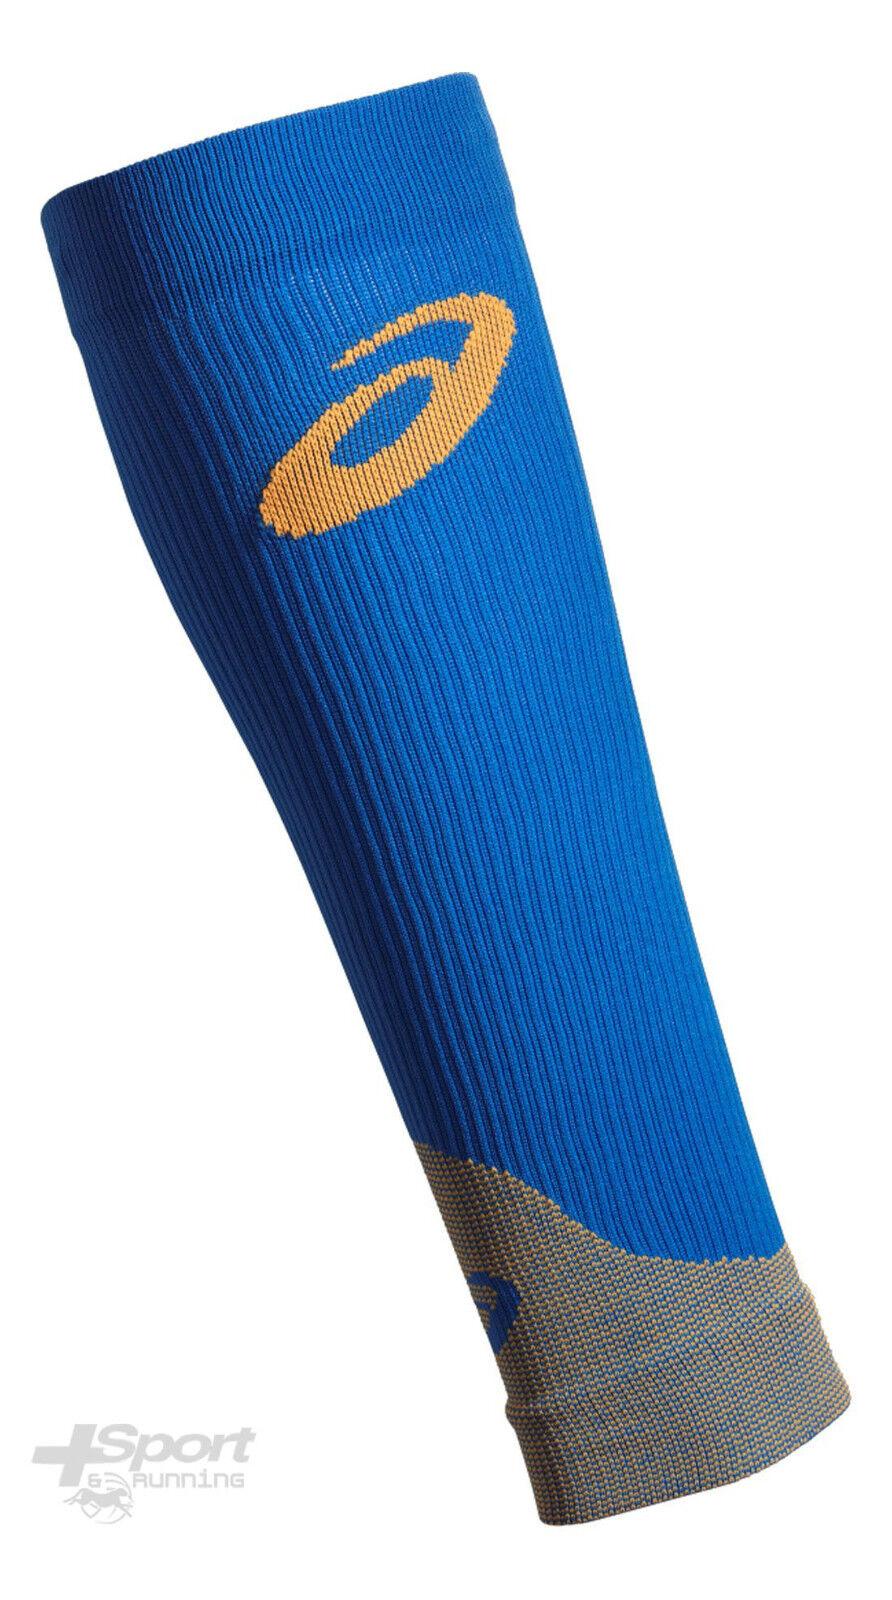 Leg Compression - Compression Calf Sleeve Asics 110526-0830